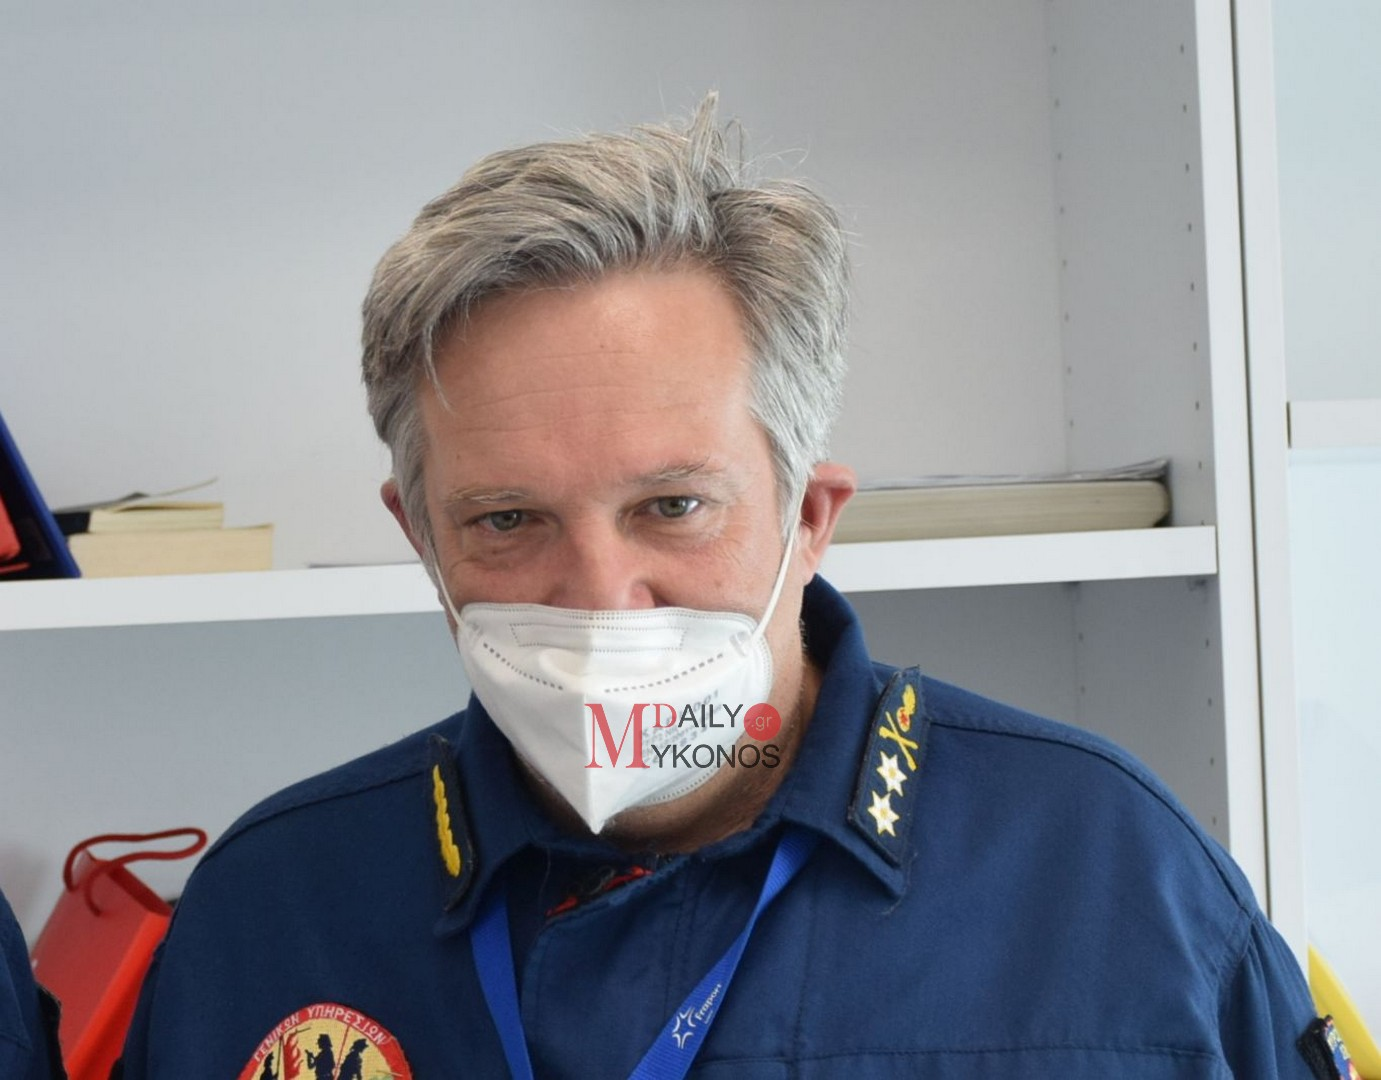 (vid) Ιωάννης Σταμούλης: Στόχος μας περισσότεροι Πυροσβέστες και ένα νέο όχημα φέτος στη Μύκονο